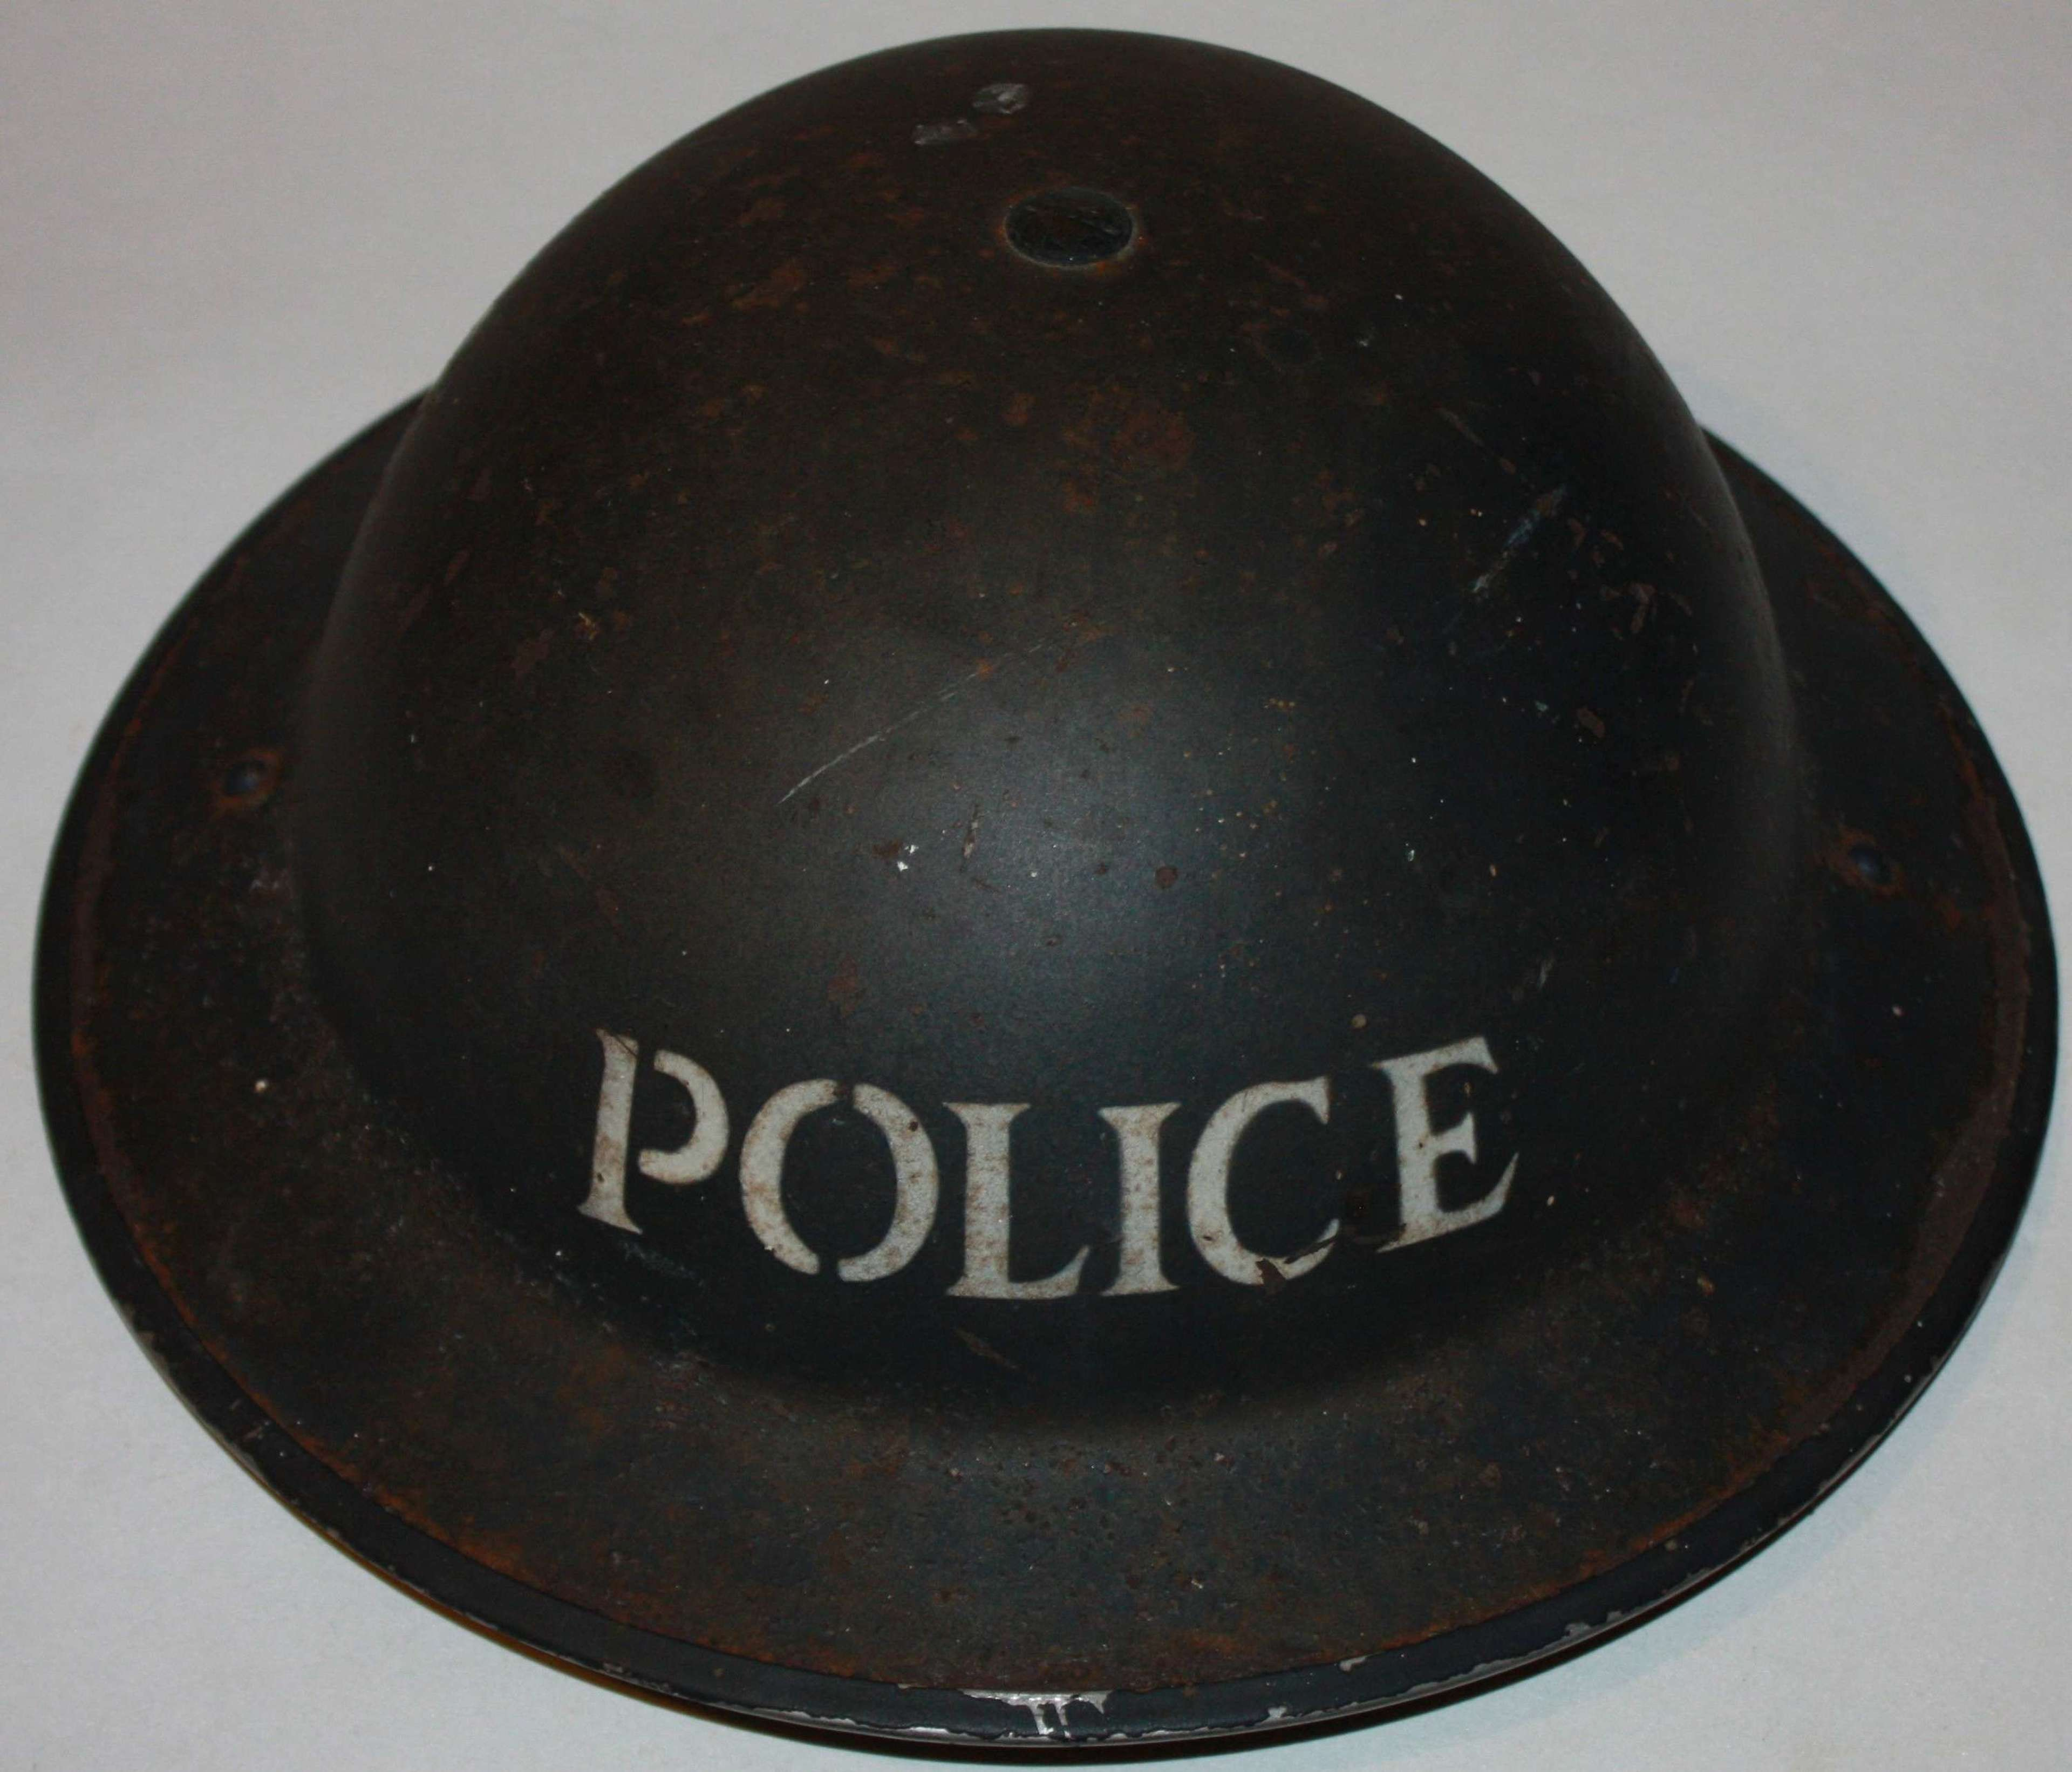 A VERY GOOD WWII 1939 DATE POLICE STEEL HEMLMET